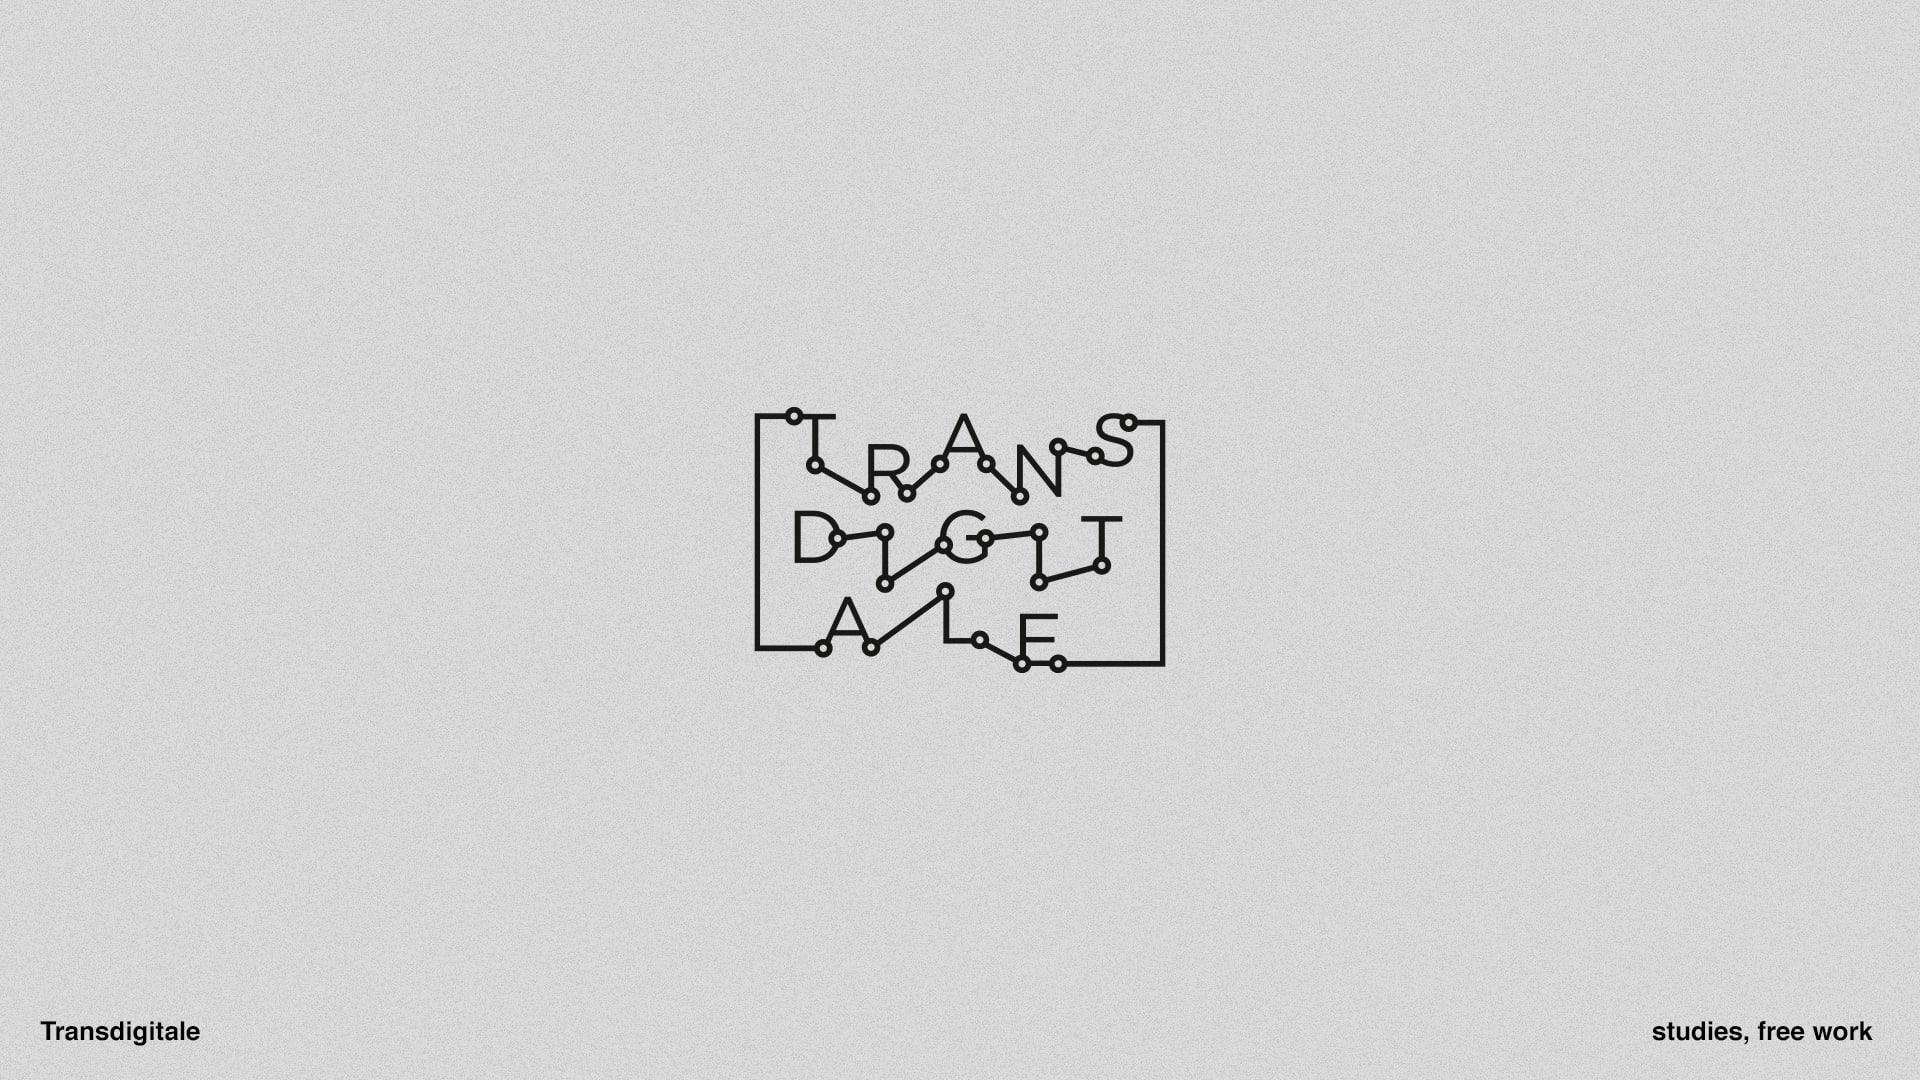 016-transdigitale